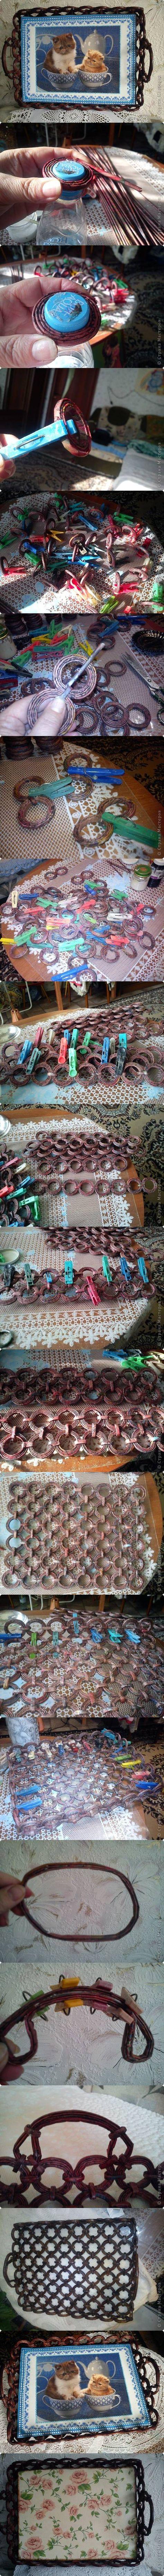 DIY Newspaper Weaving Tray